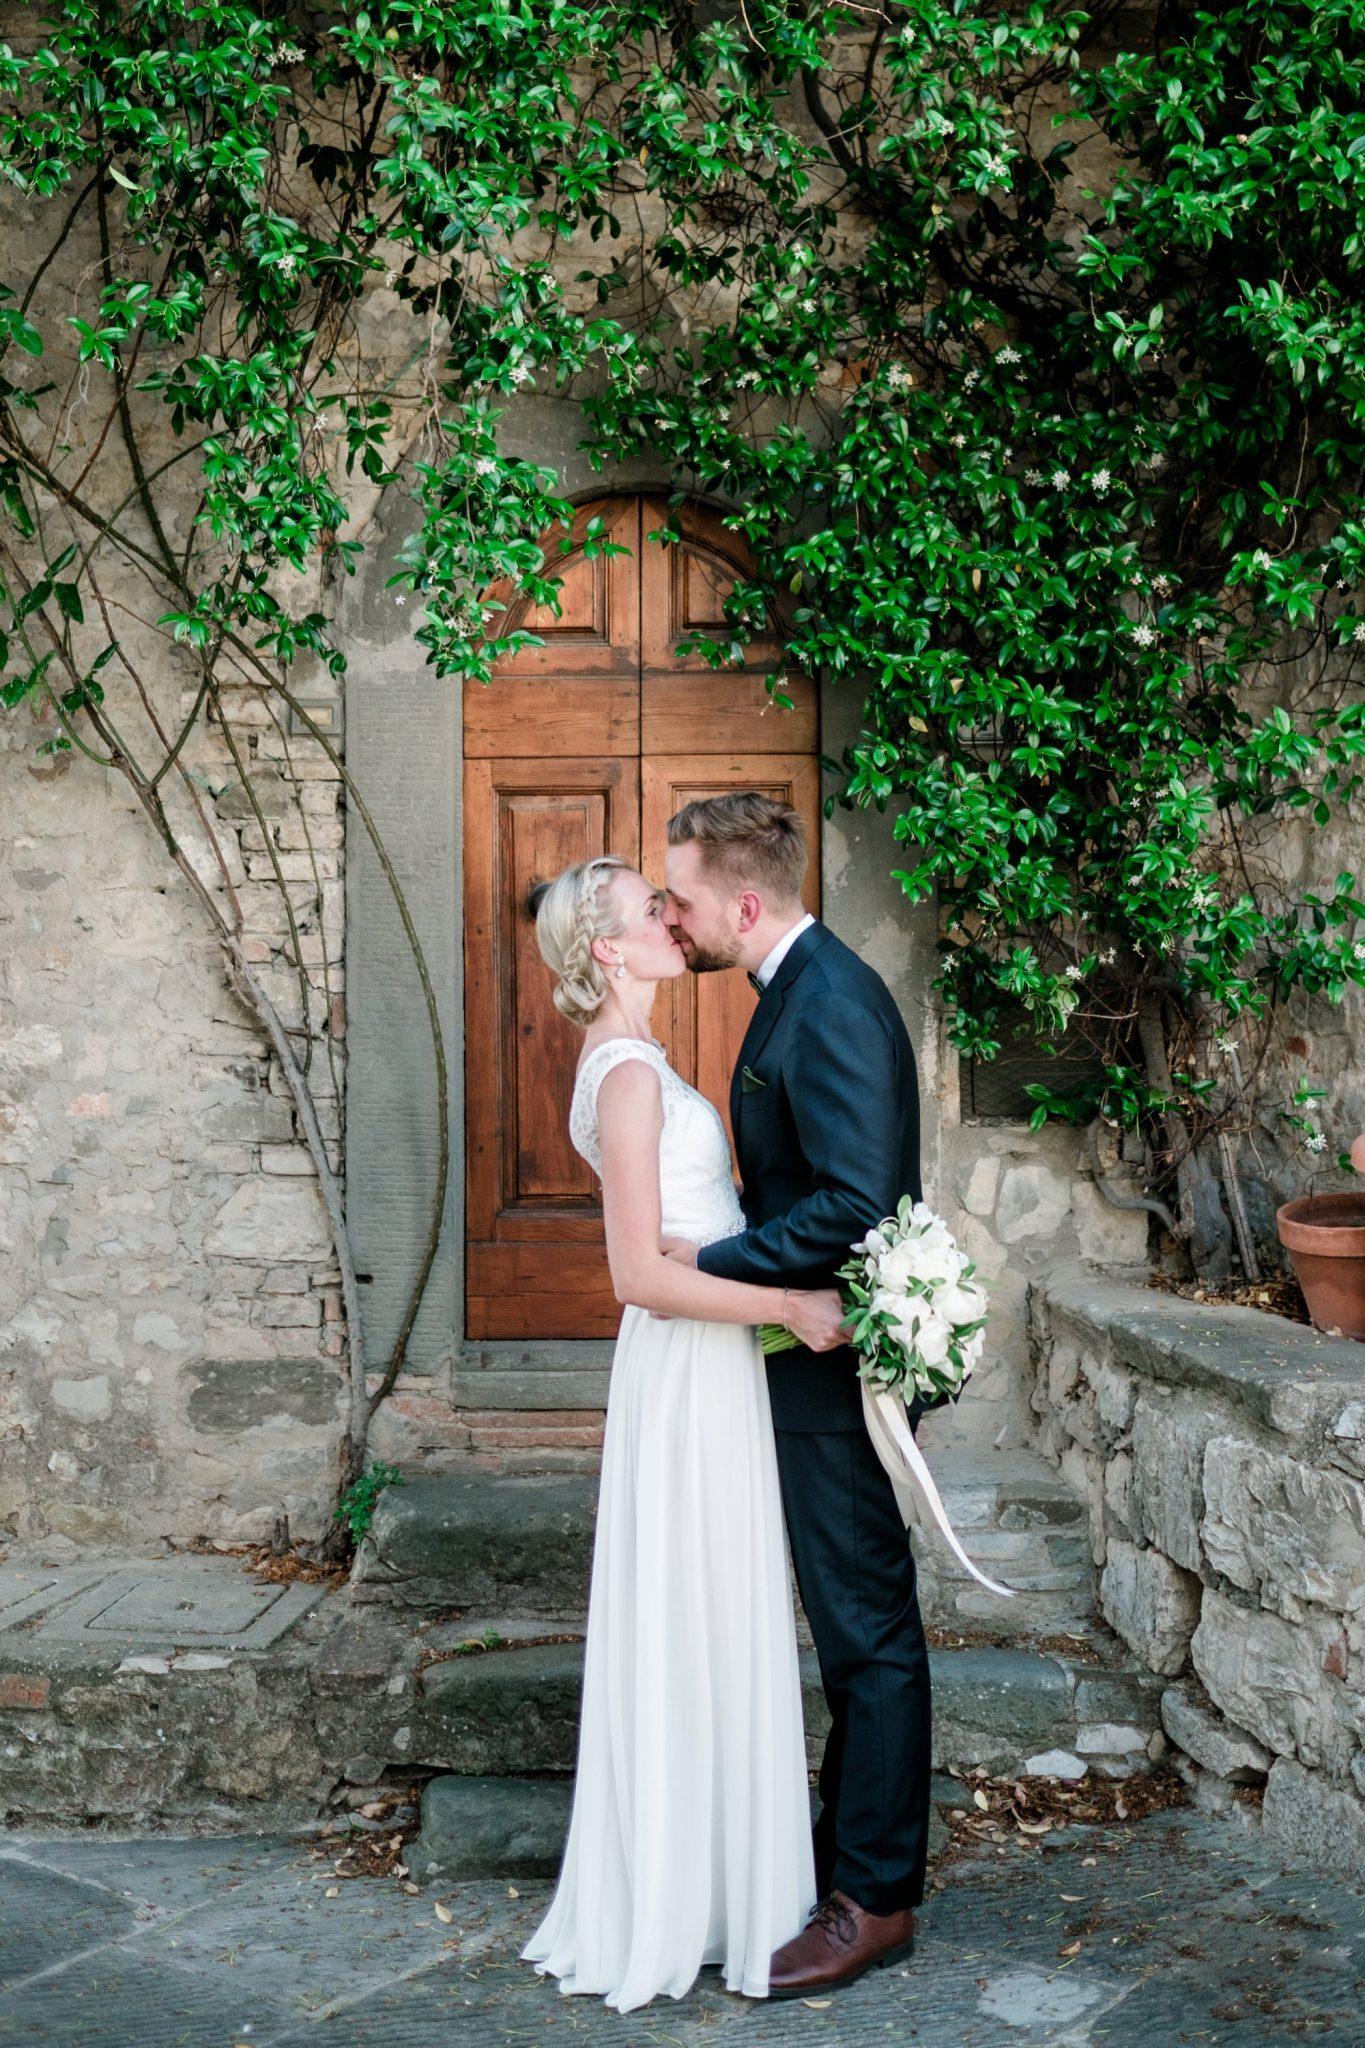 Intimate wedding in Chianti, Intimate wedding in Chianti – Petter&Lisa